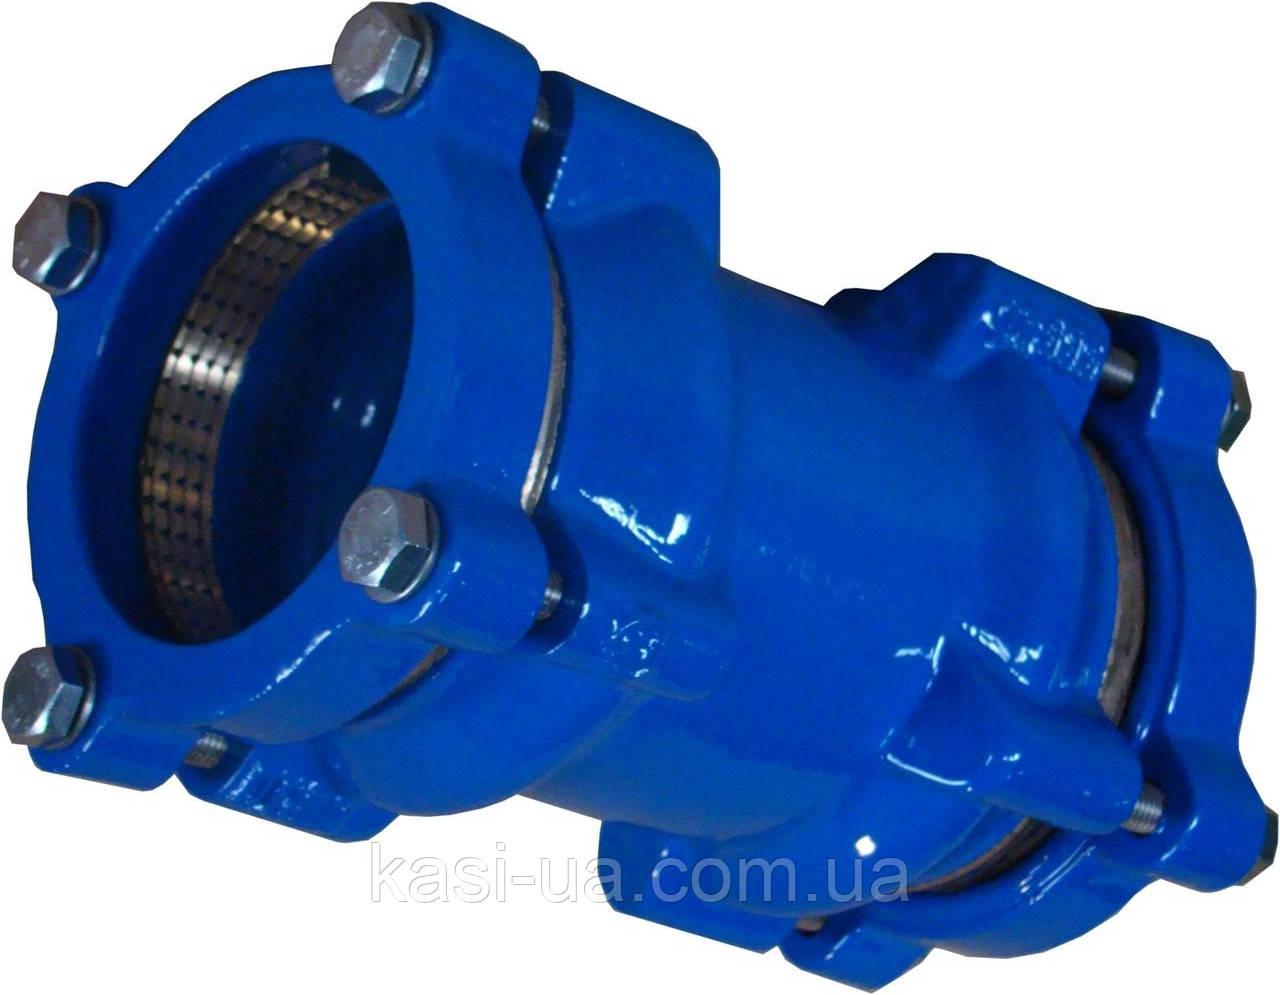 Муфта соединительная для ПЕ/ПВХ труб тип 9123 JAFAR, чугун GGG50, DN 50 Dz 63